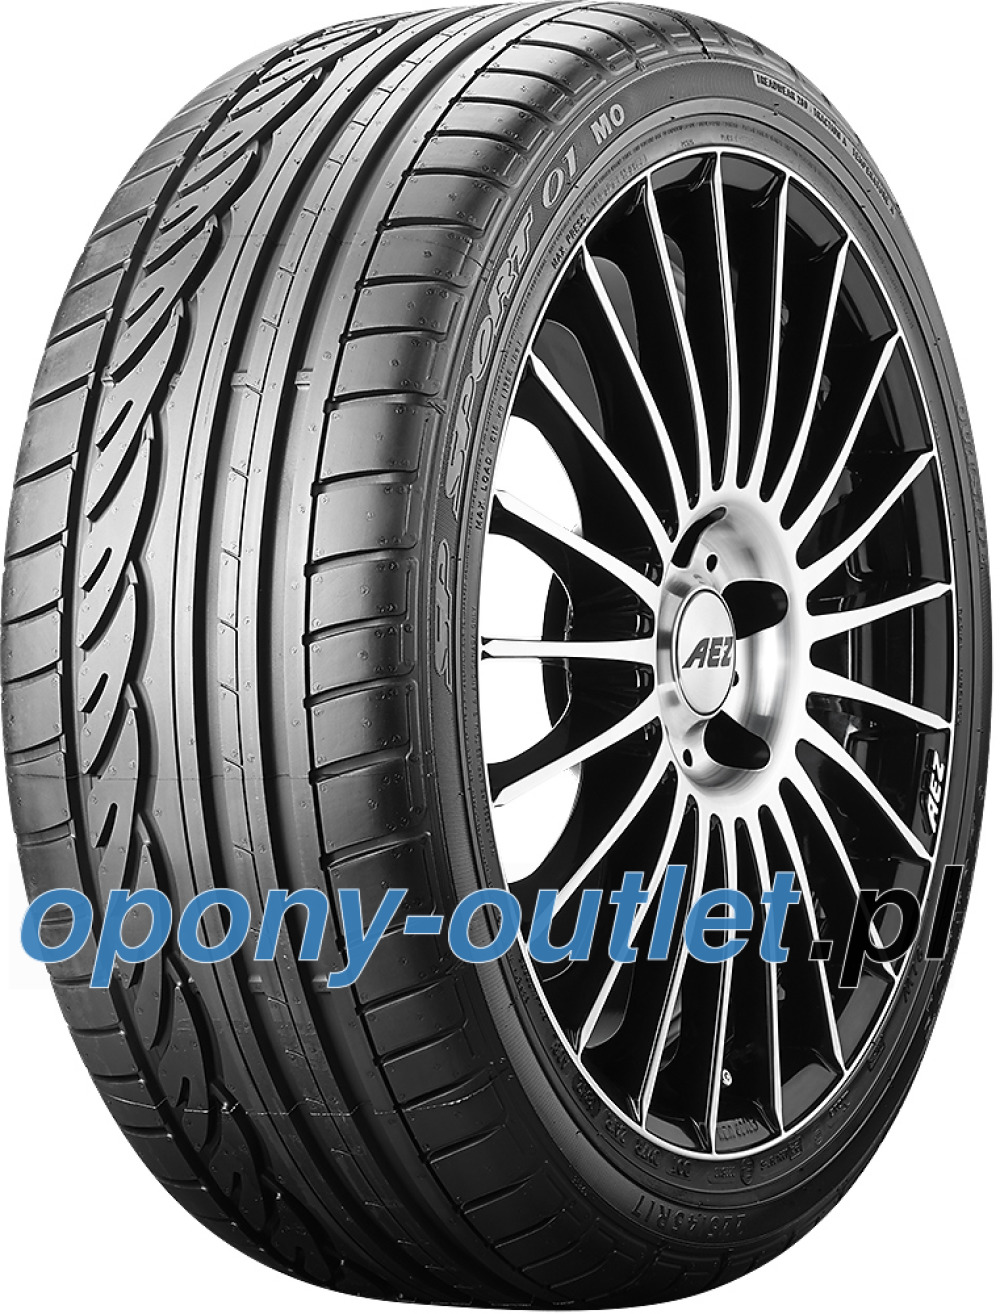 Dunlop SP Sport 01 ( 225/55 R16 95V osłona felgi (MFS), * )